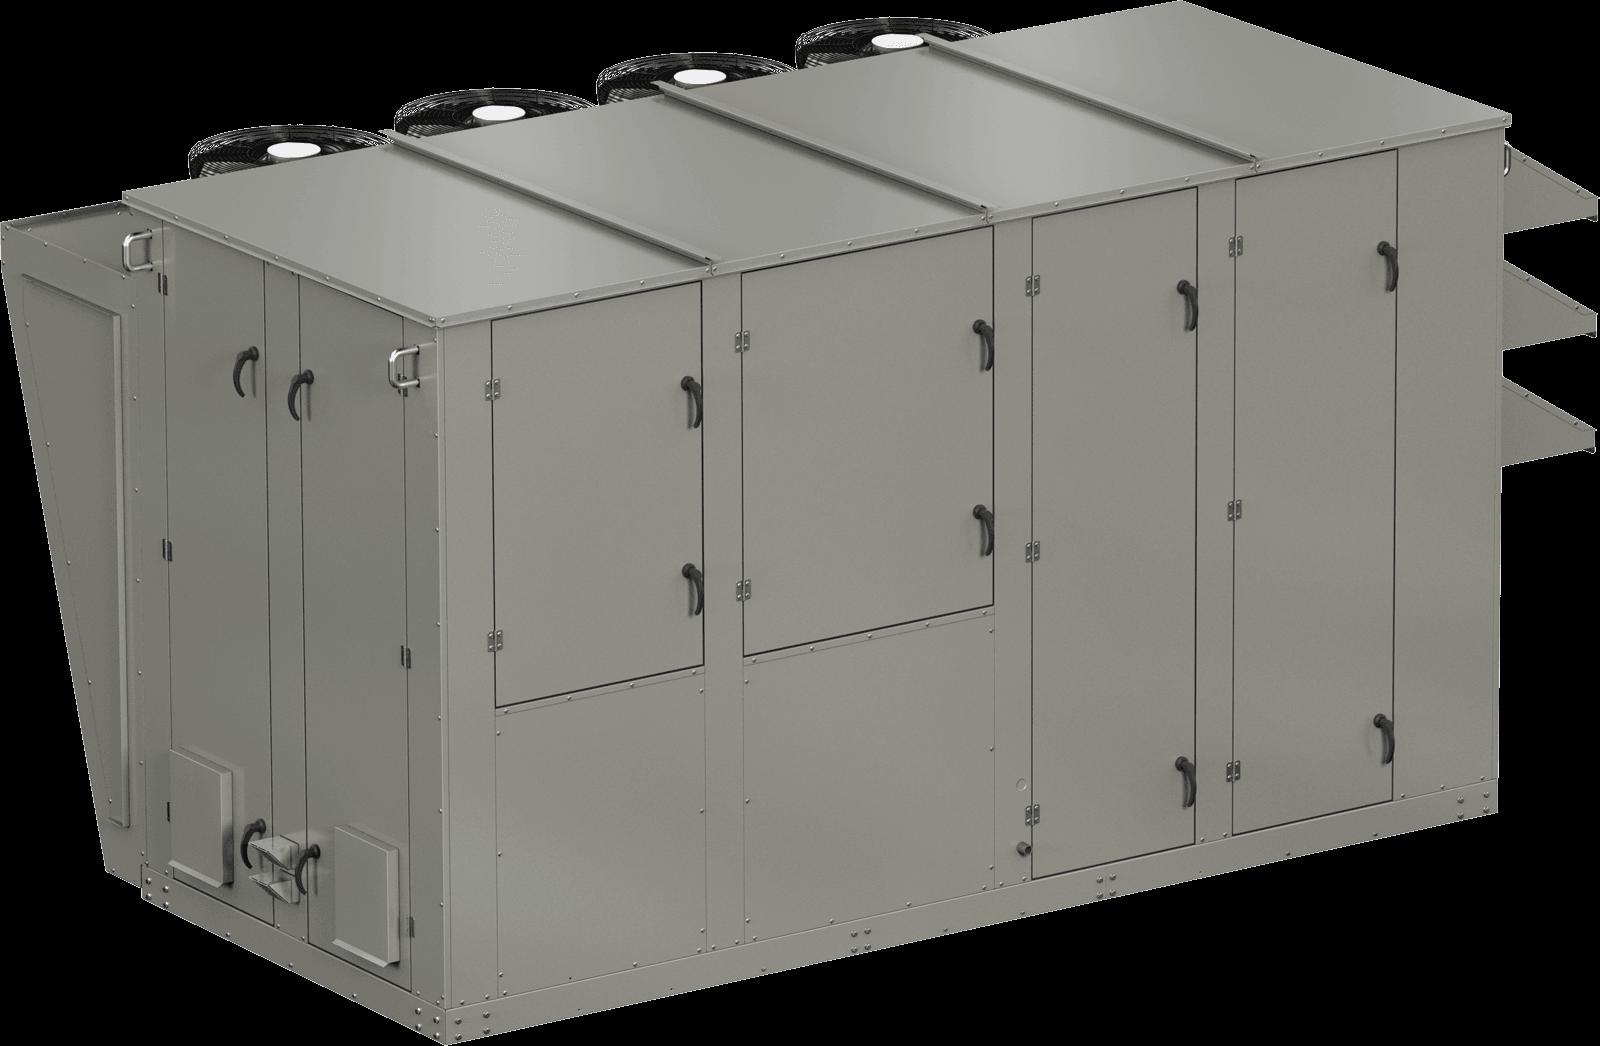 Model XRV 120 Condenser Alternative Dedicated Outdoor Air System Rendering